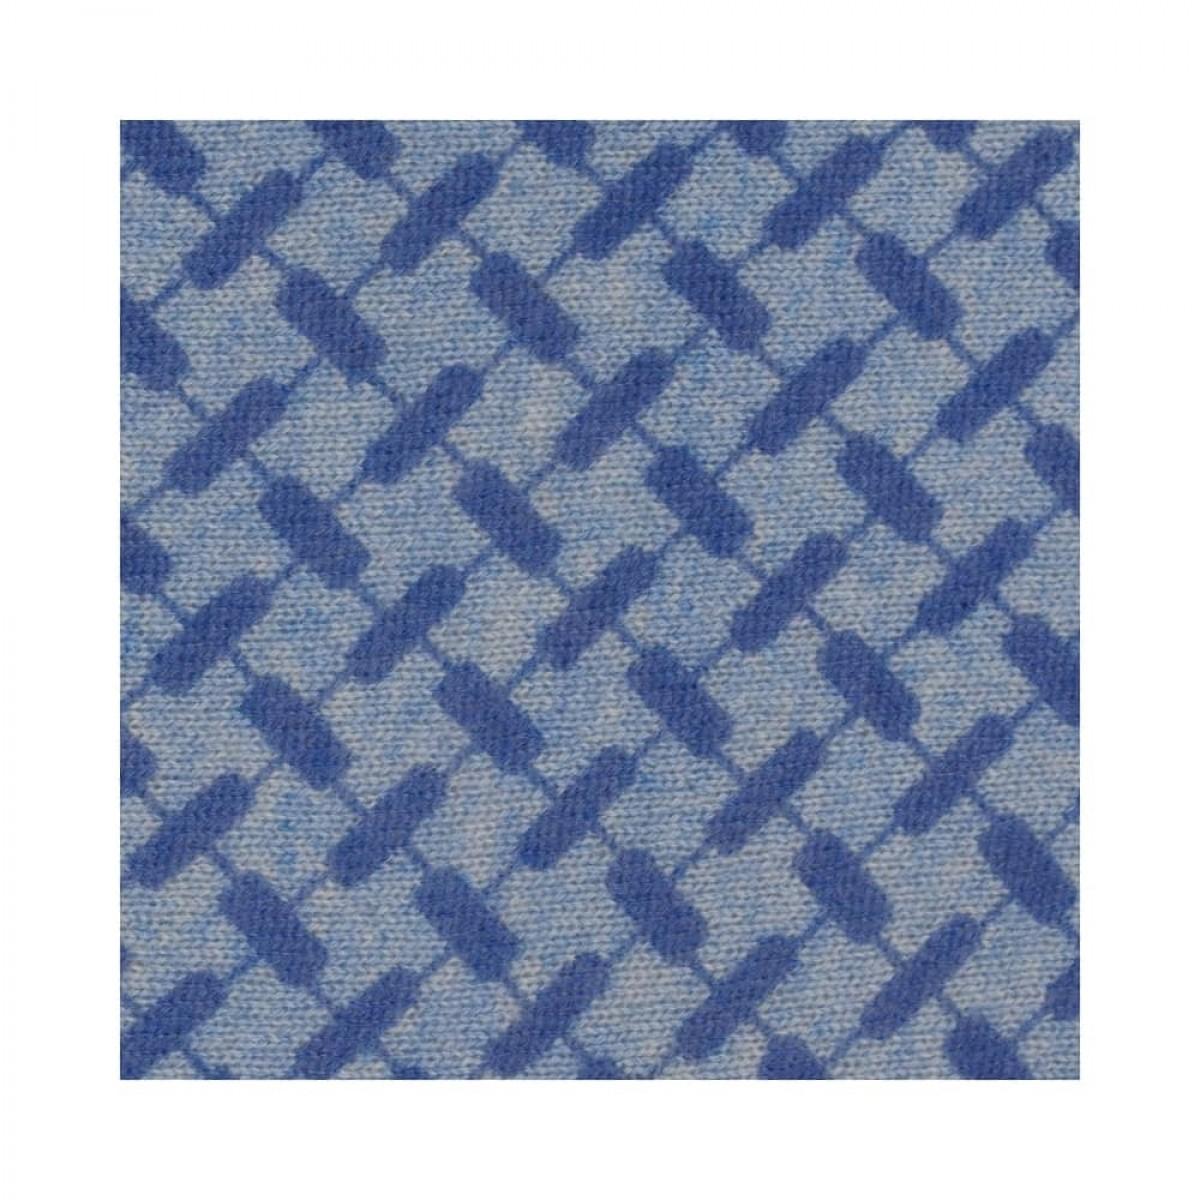 triangle trinity classic m - blue on criket - kvaltet